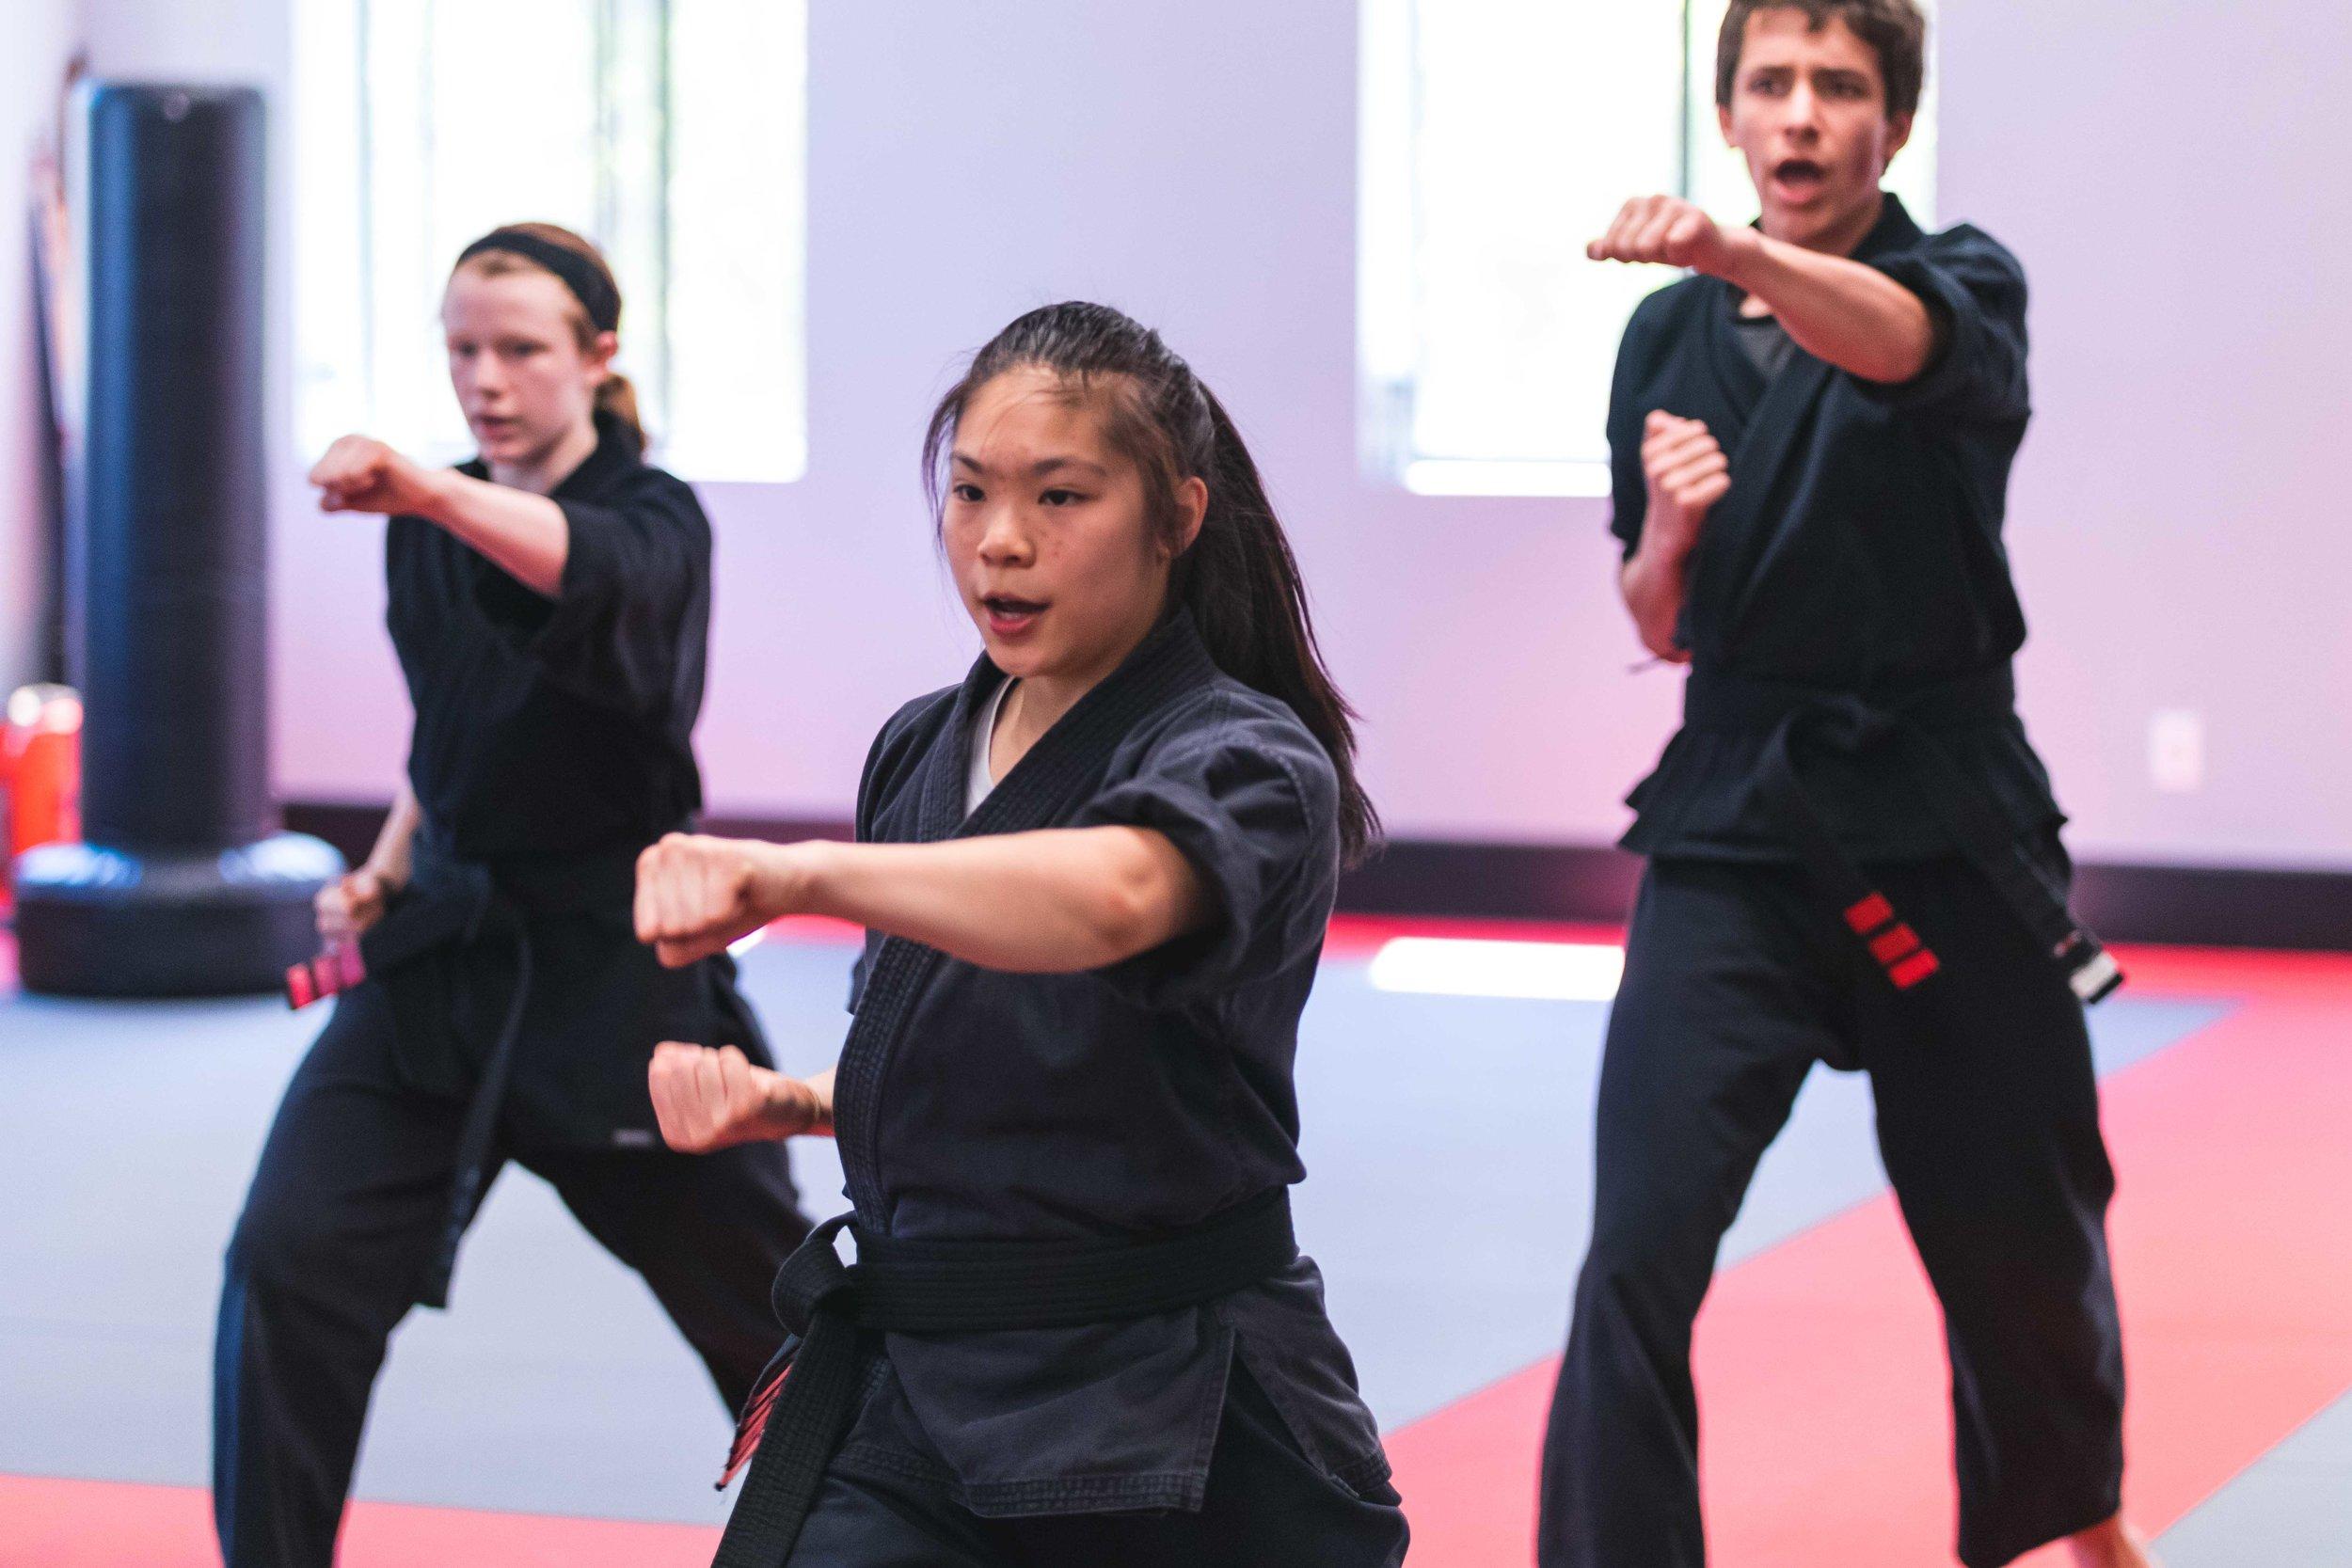 Karate for Teenagers in Bedford MA Callahans Karate Family Martial Arts Program.jpg